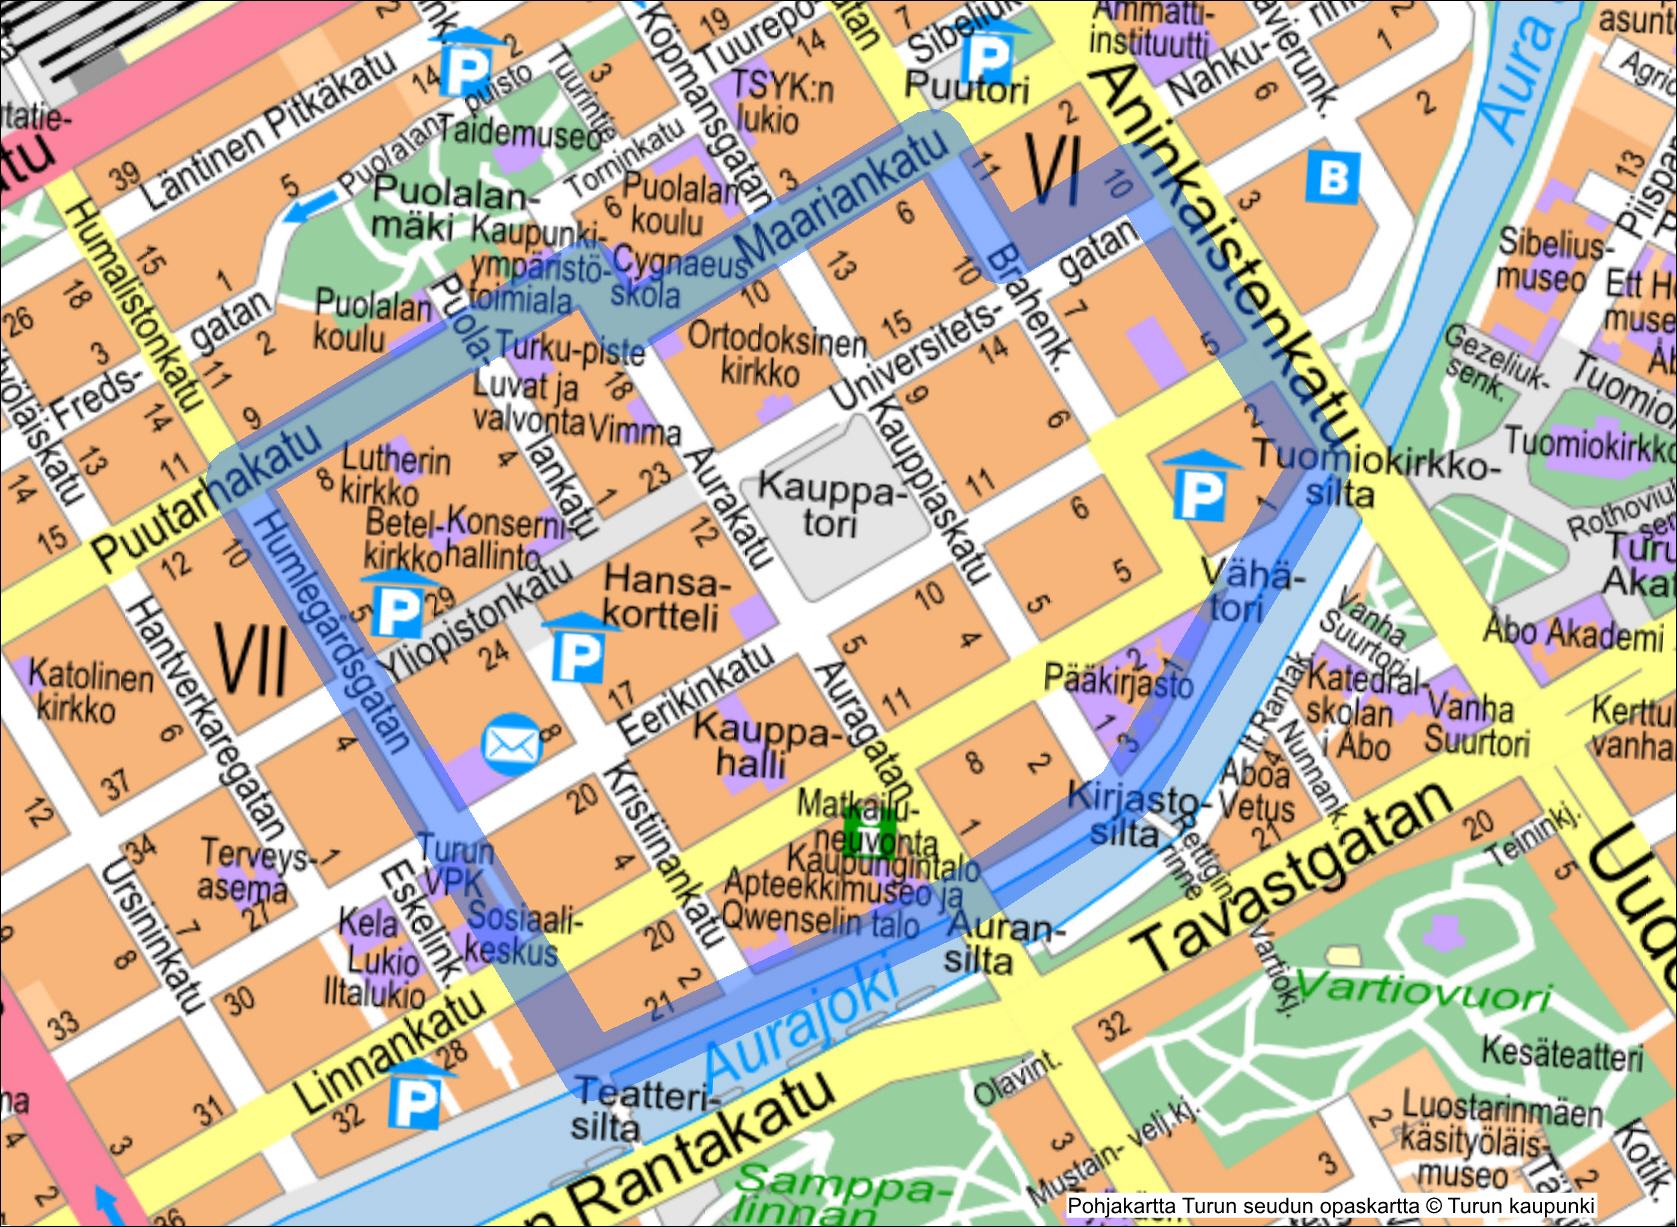 Turun Kaupungin Kartta